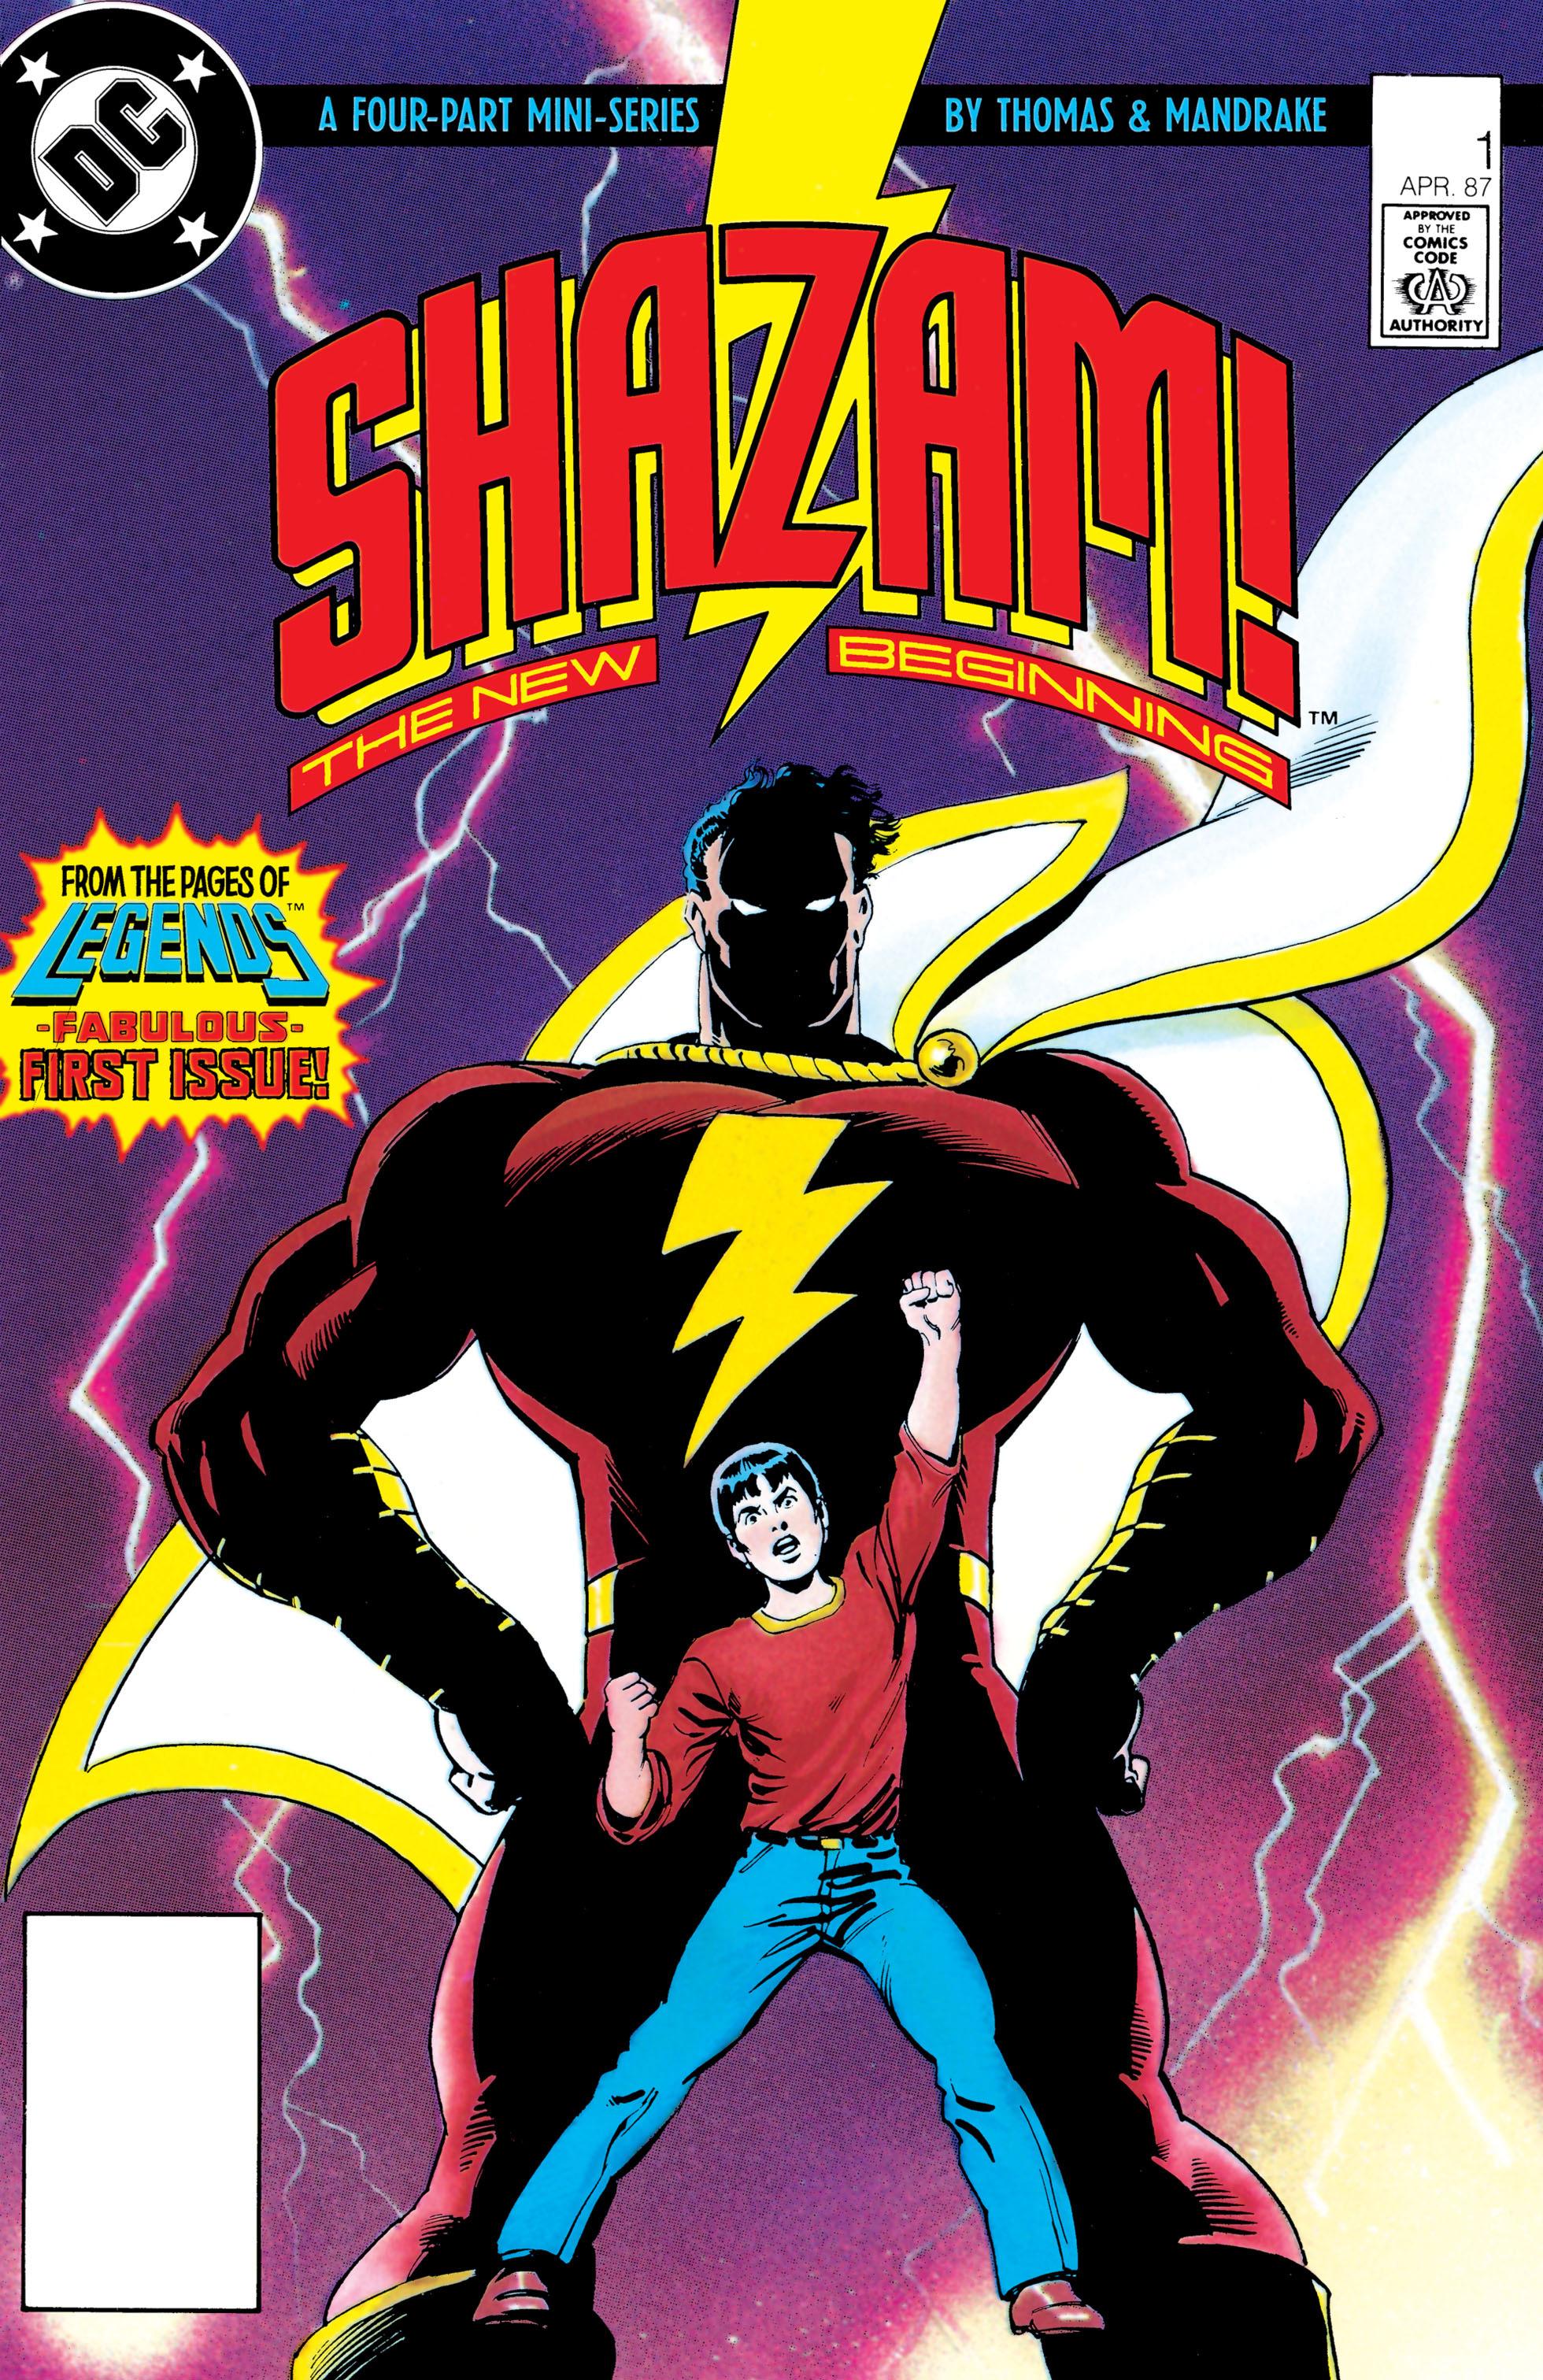 Shazam!: The New Beginning 1 Page 1